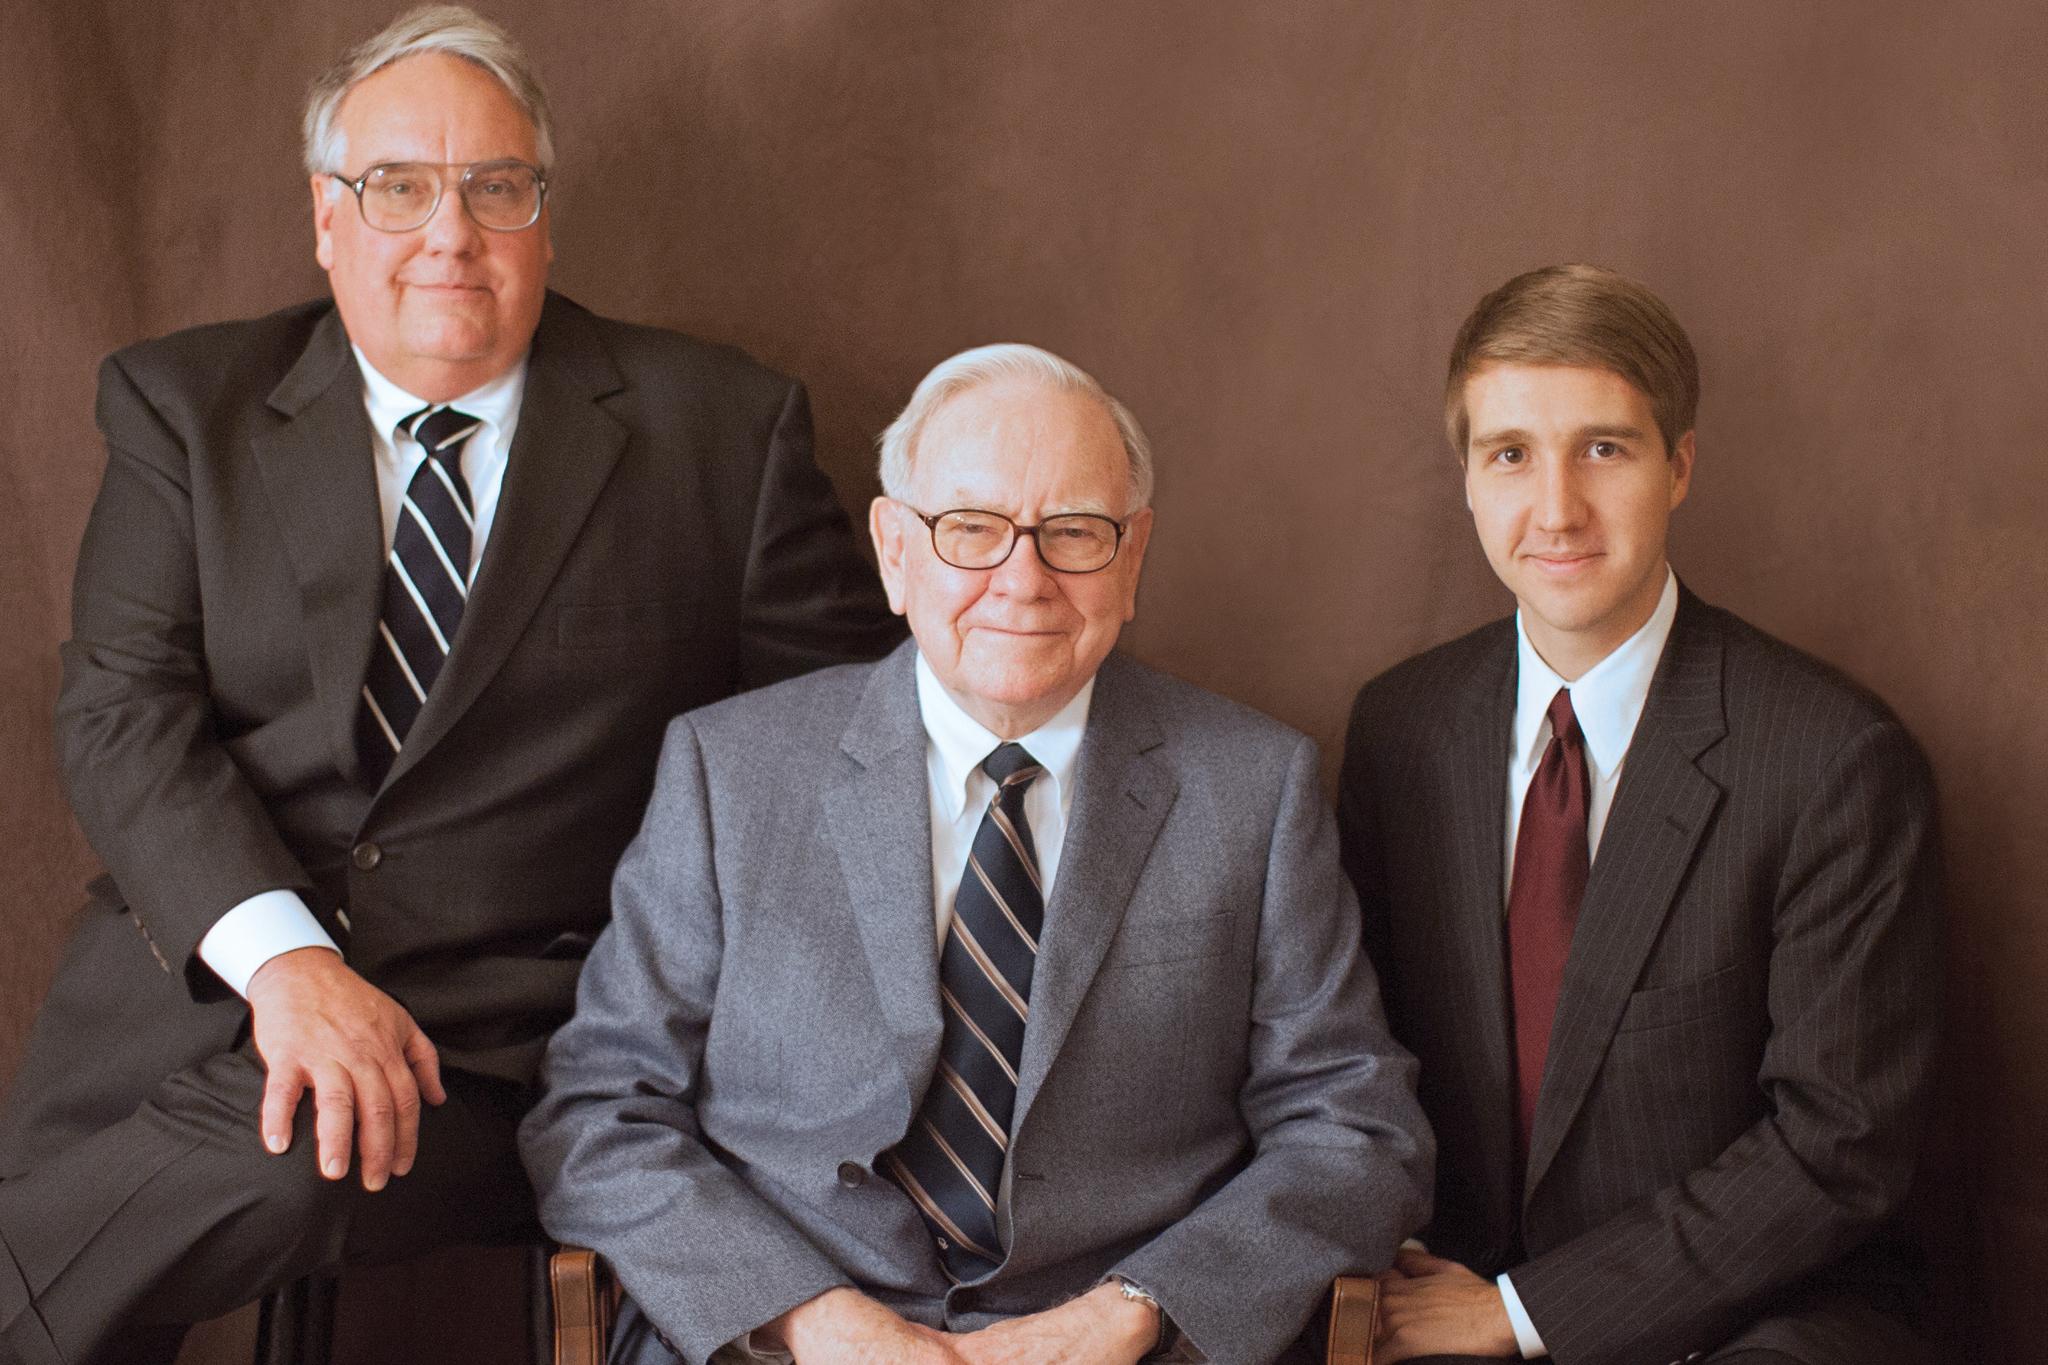 Live from the NYPL: Warren Buffett, Howard G. Buffett and Howard W. Buffett